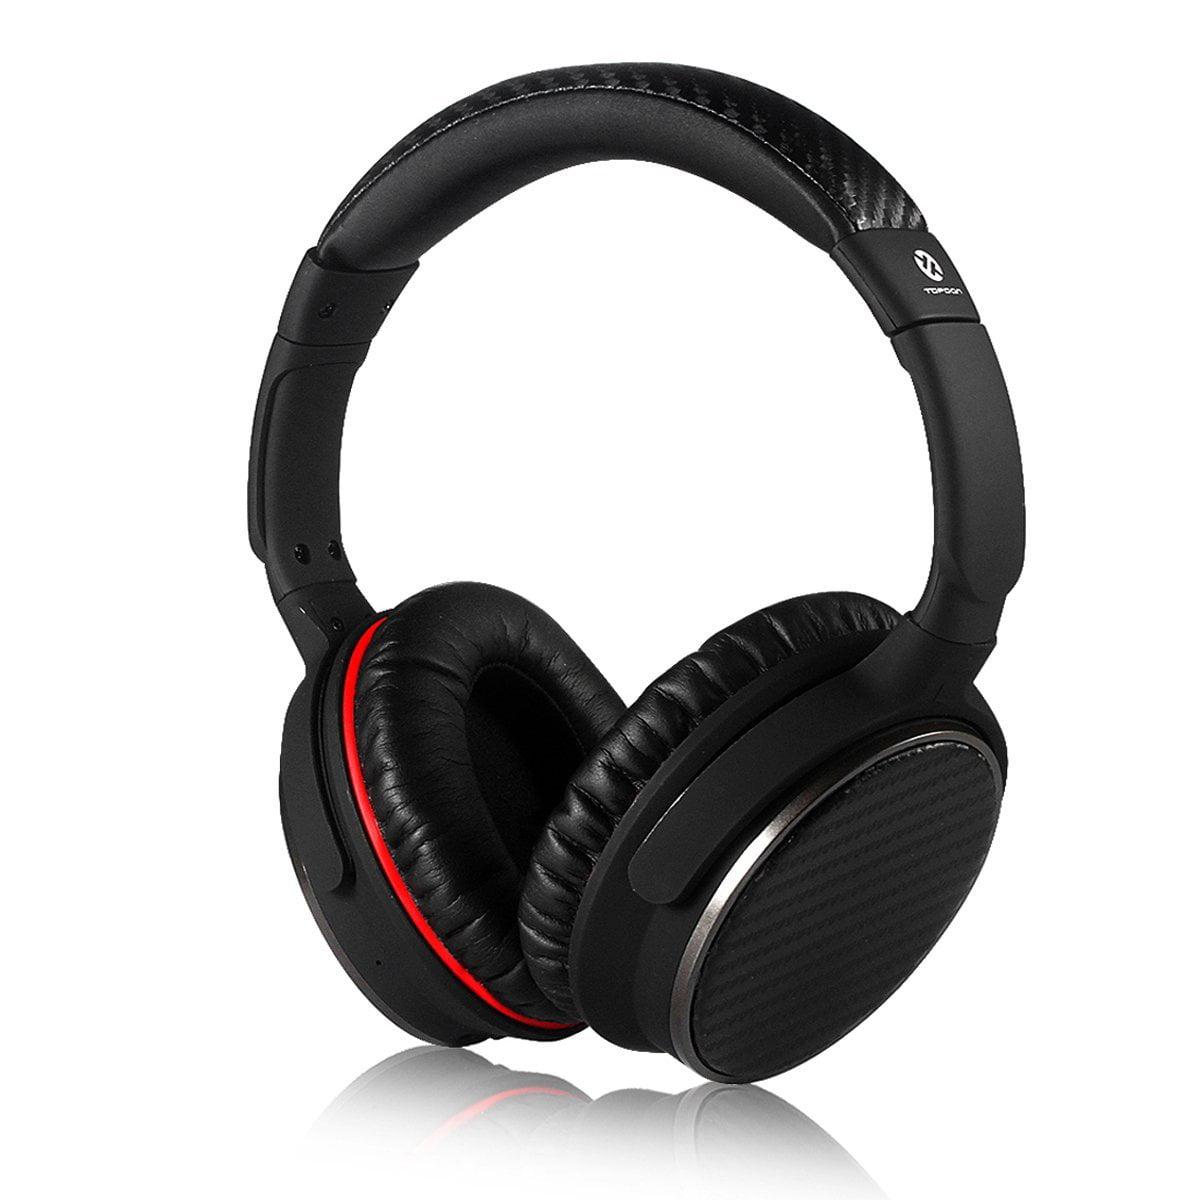 Bluetooth Headphones Over Ear, Topdon TP550 Lightweight Wireless Bluetooth Headphone with Microphone